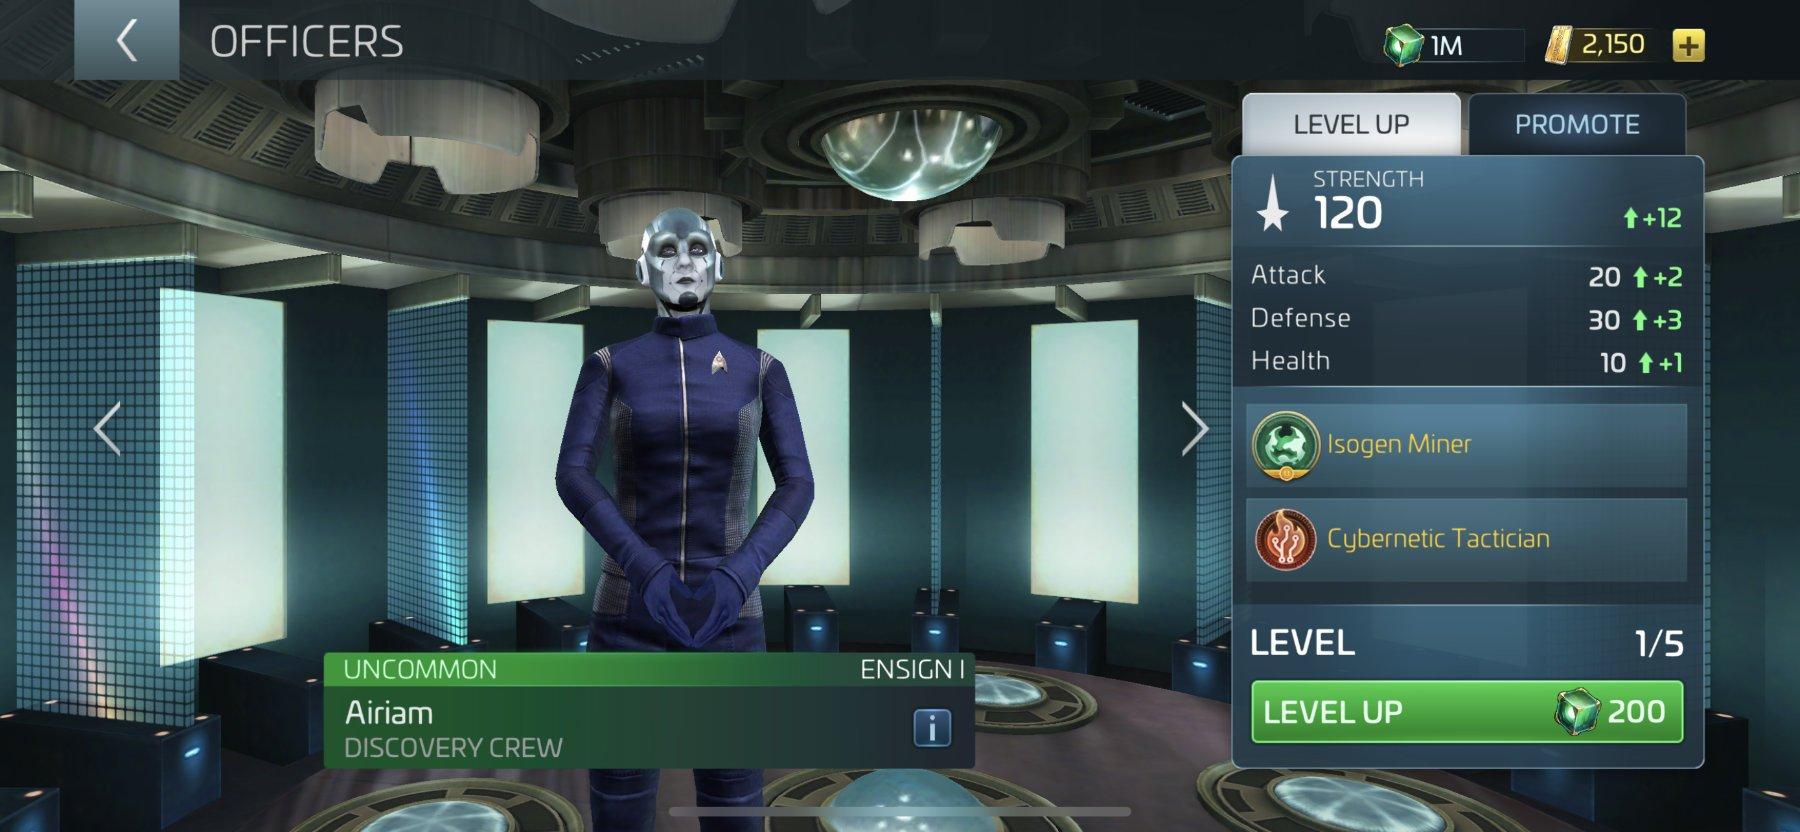 Star Trek Fleet Command Officer Airiam